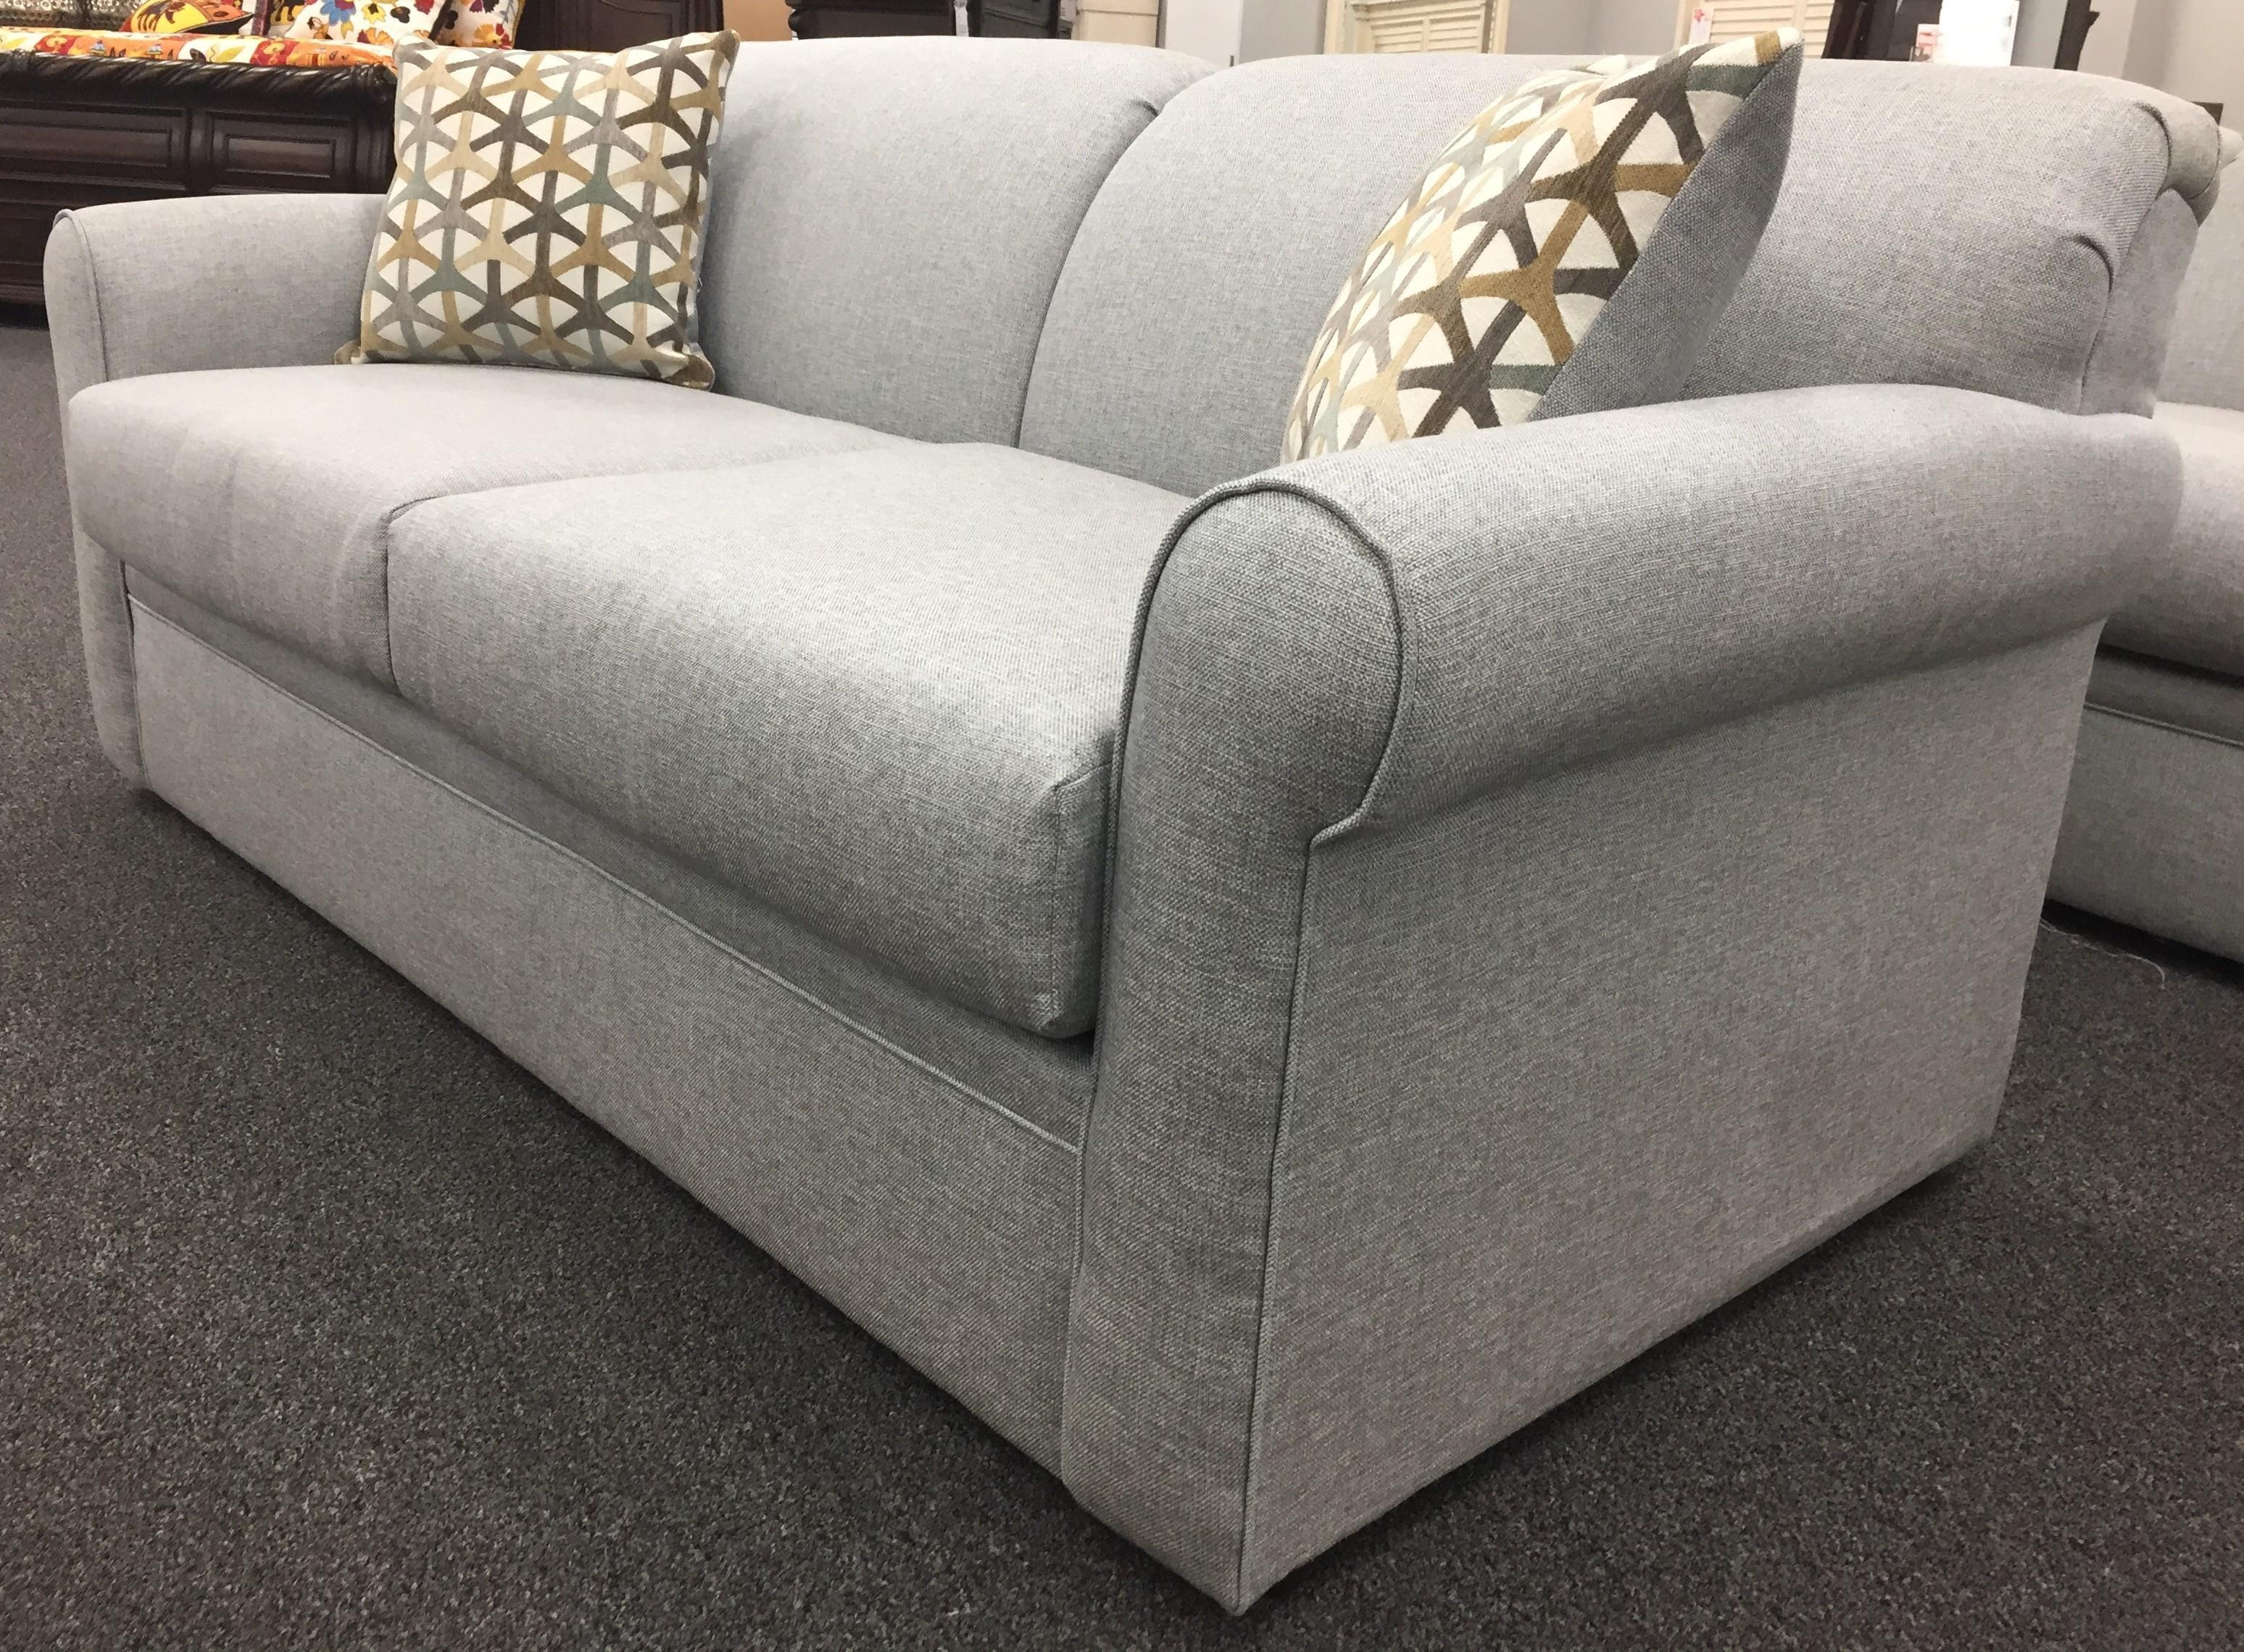 2300 Loveseat by Overnight Sofa at Furniture Fair - North Carolina